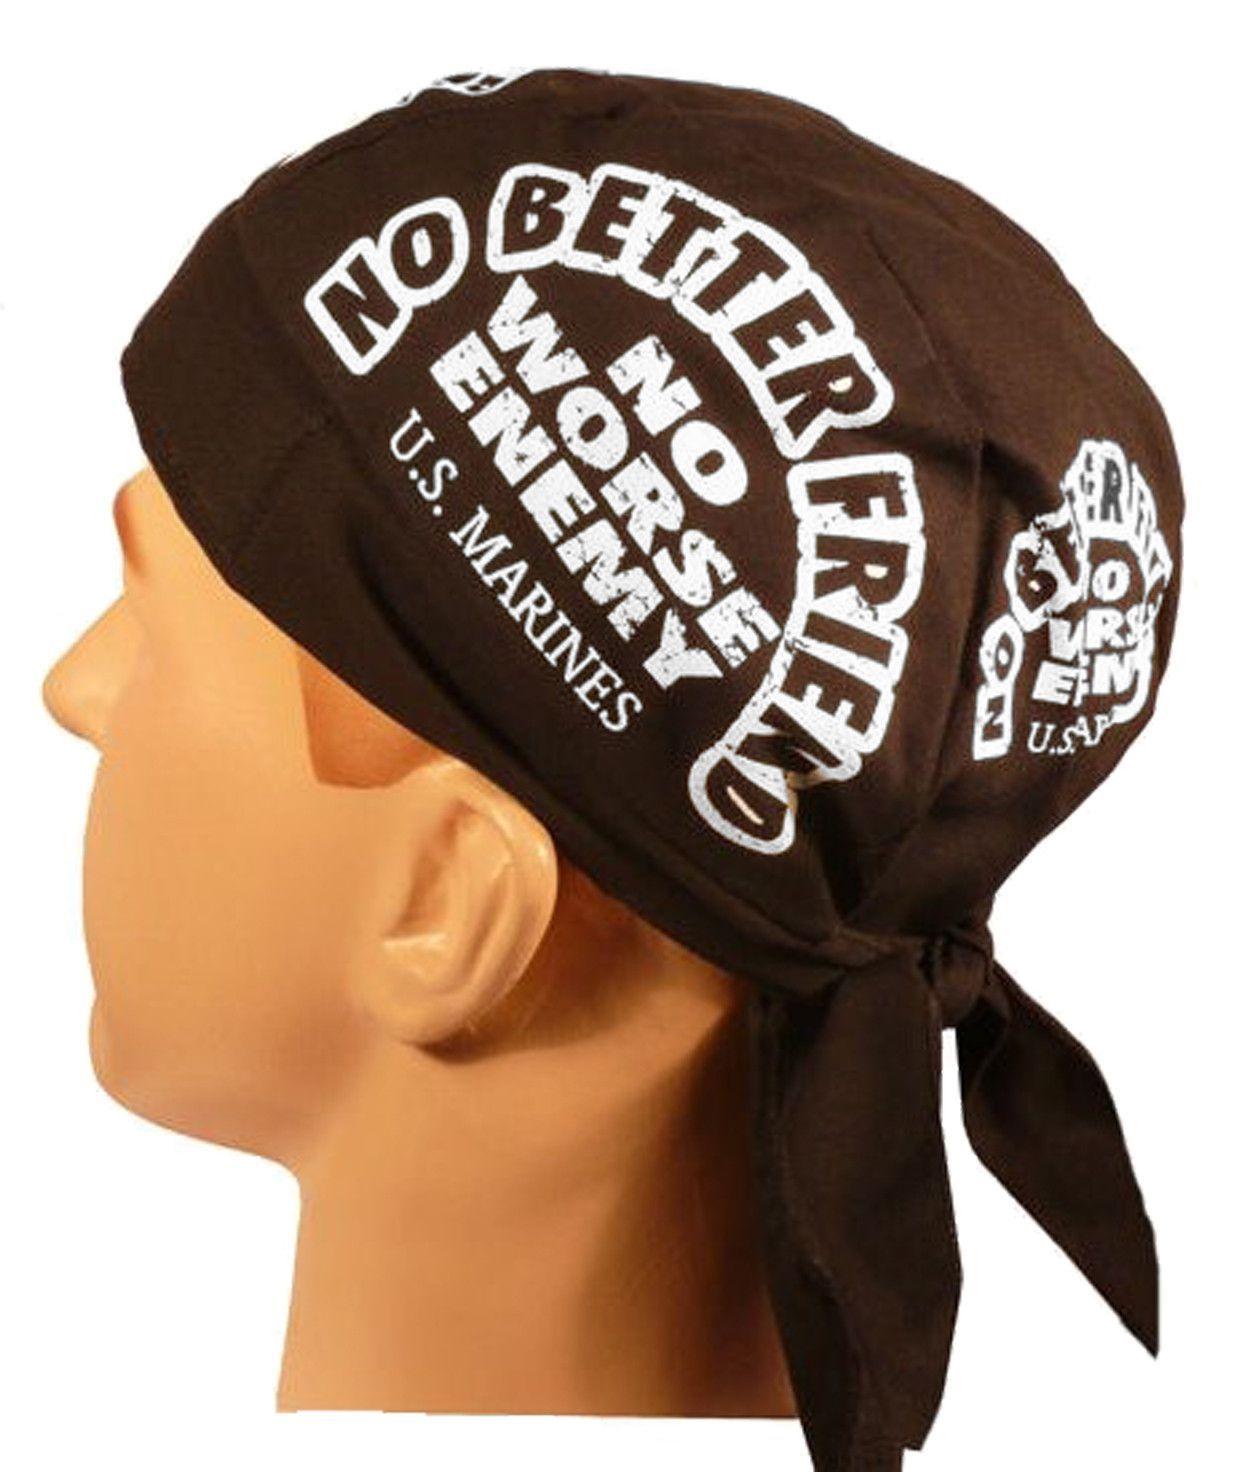 Marine Deluxe Doo Rag SWEAT BAND Black Head Wrap Durag Skull Cap Cotton  Sporty Motorcycle Do Hat 4fb1130948c6